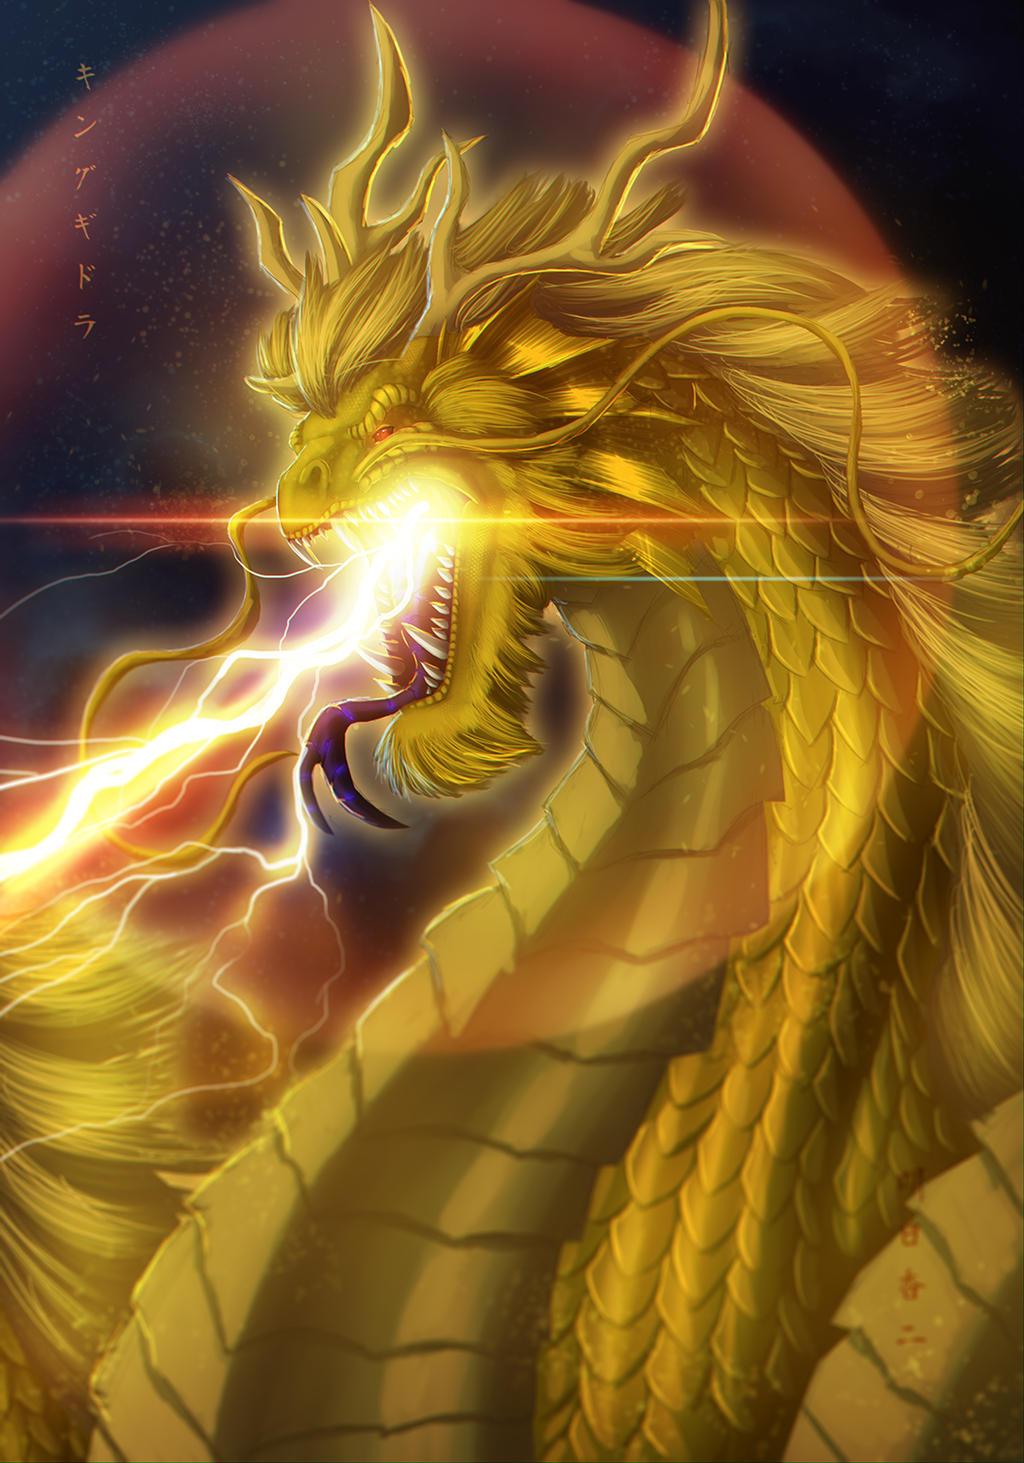 King Ghidorah Redesign by Ghostwalker2061 on DeviantArt